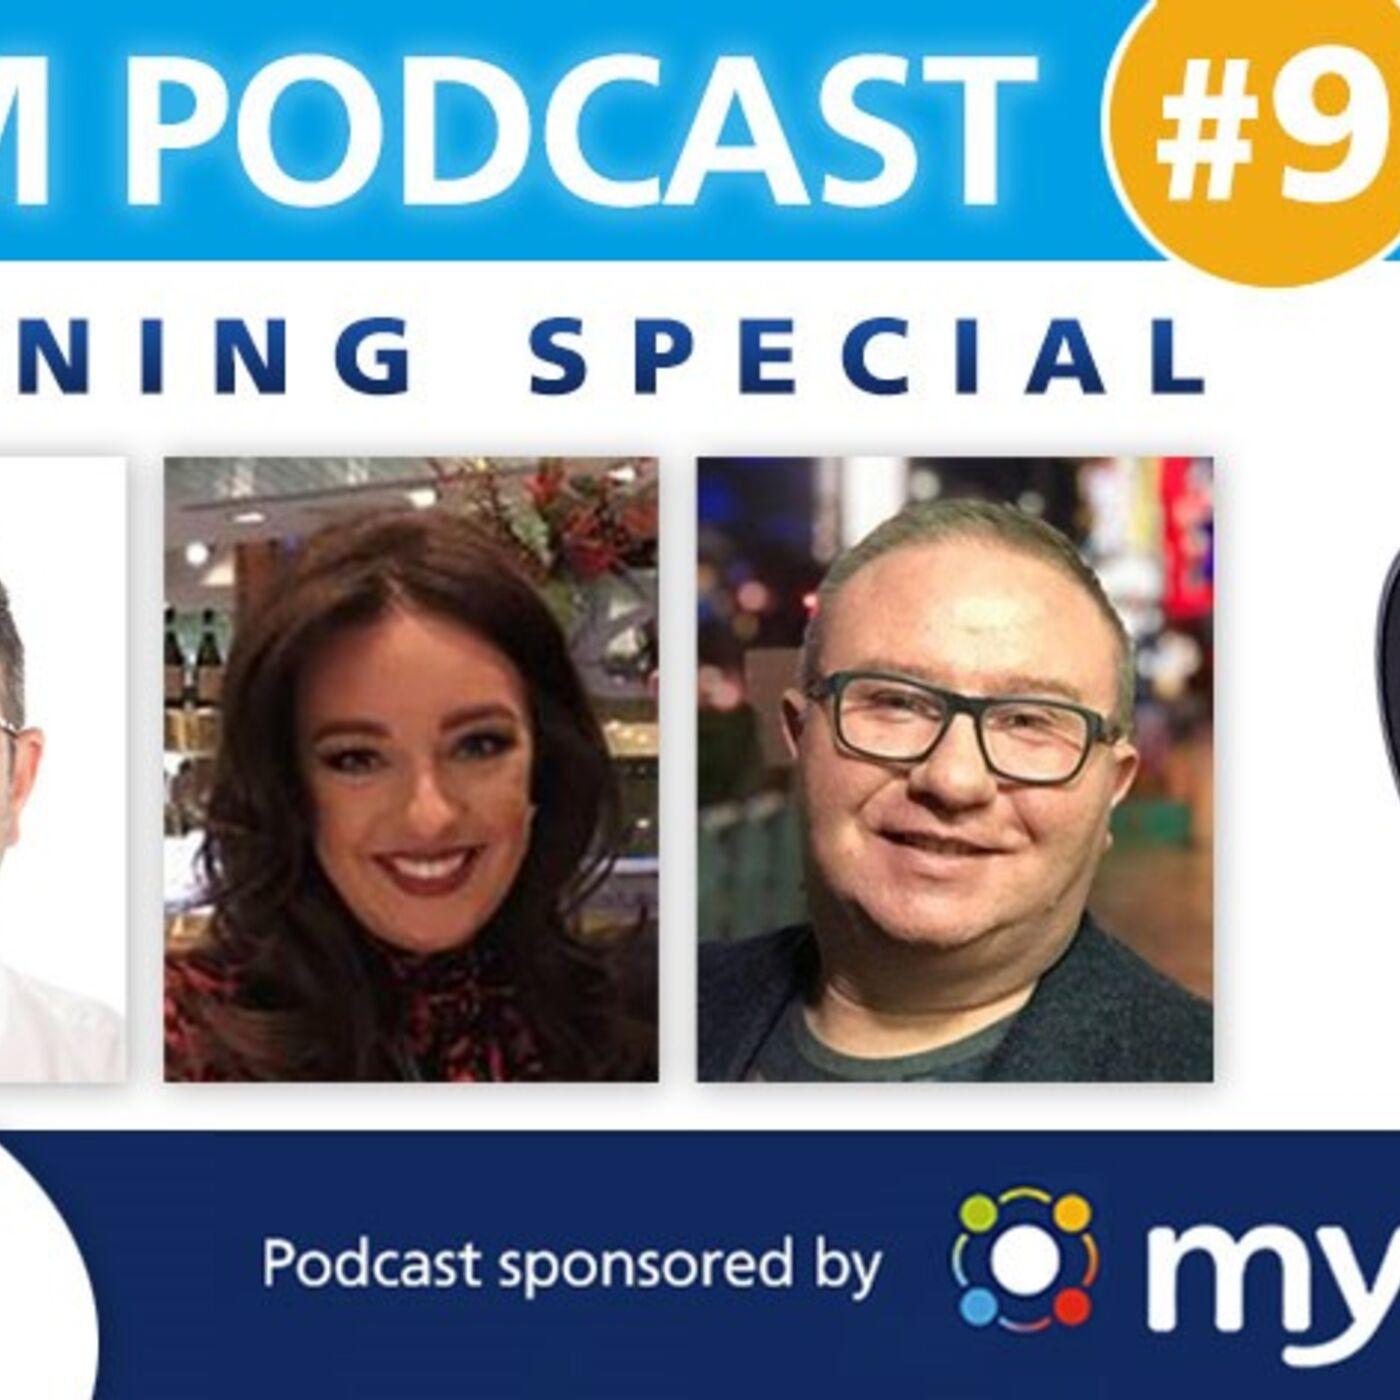 Care Home Management Training Special Podcast